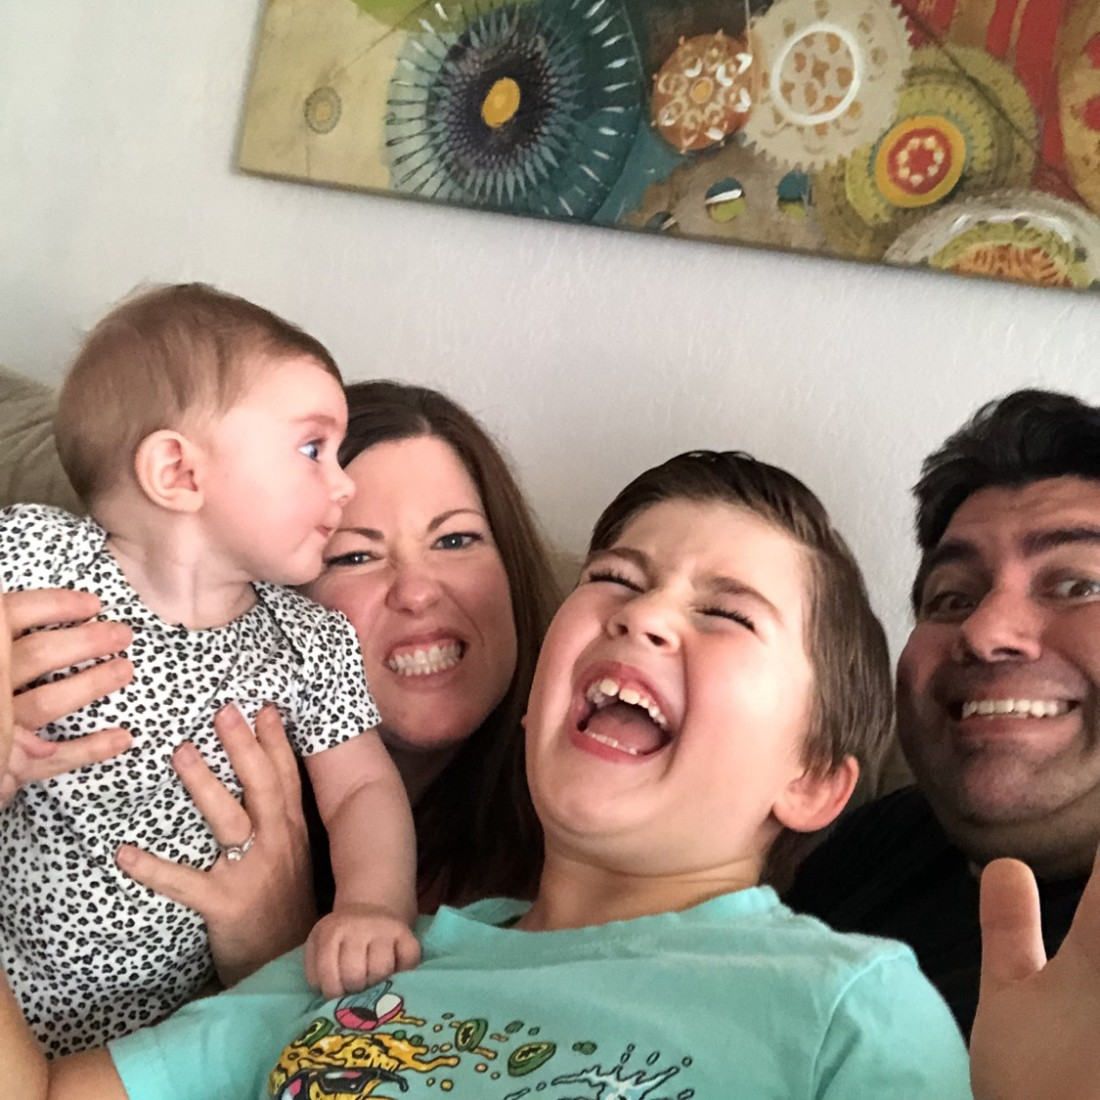 Brayden Romo's family fun picture. Photo courtesy of Bryan Feci.